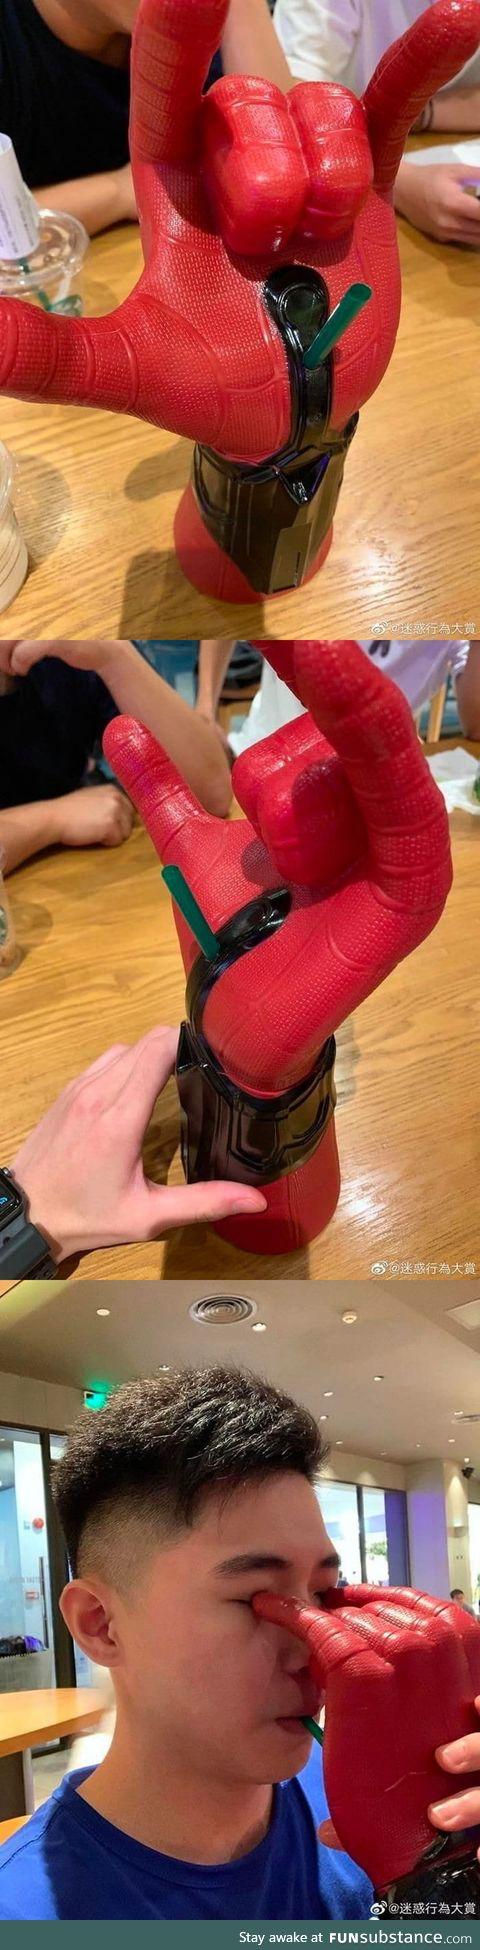 Nice Spiderman cup